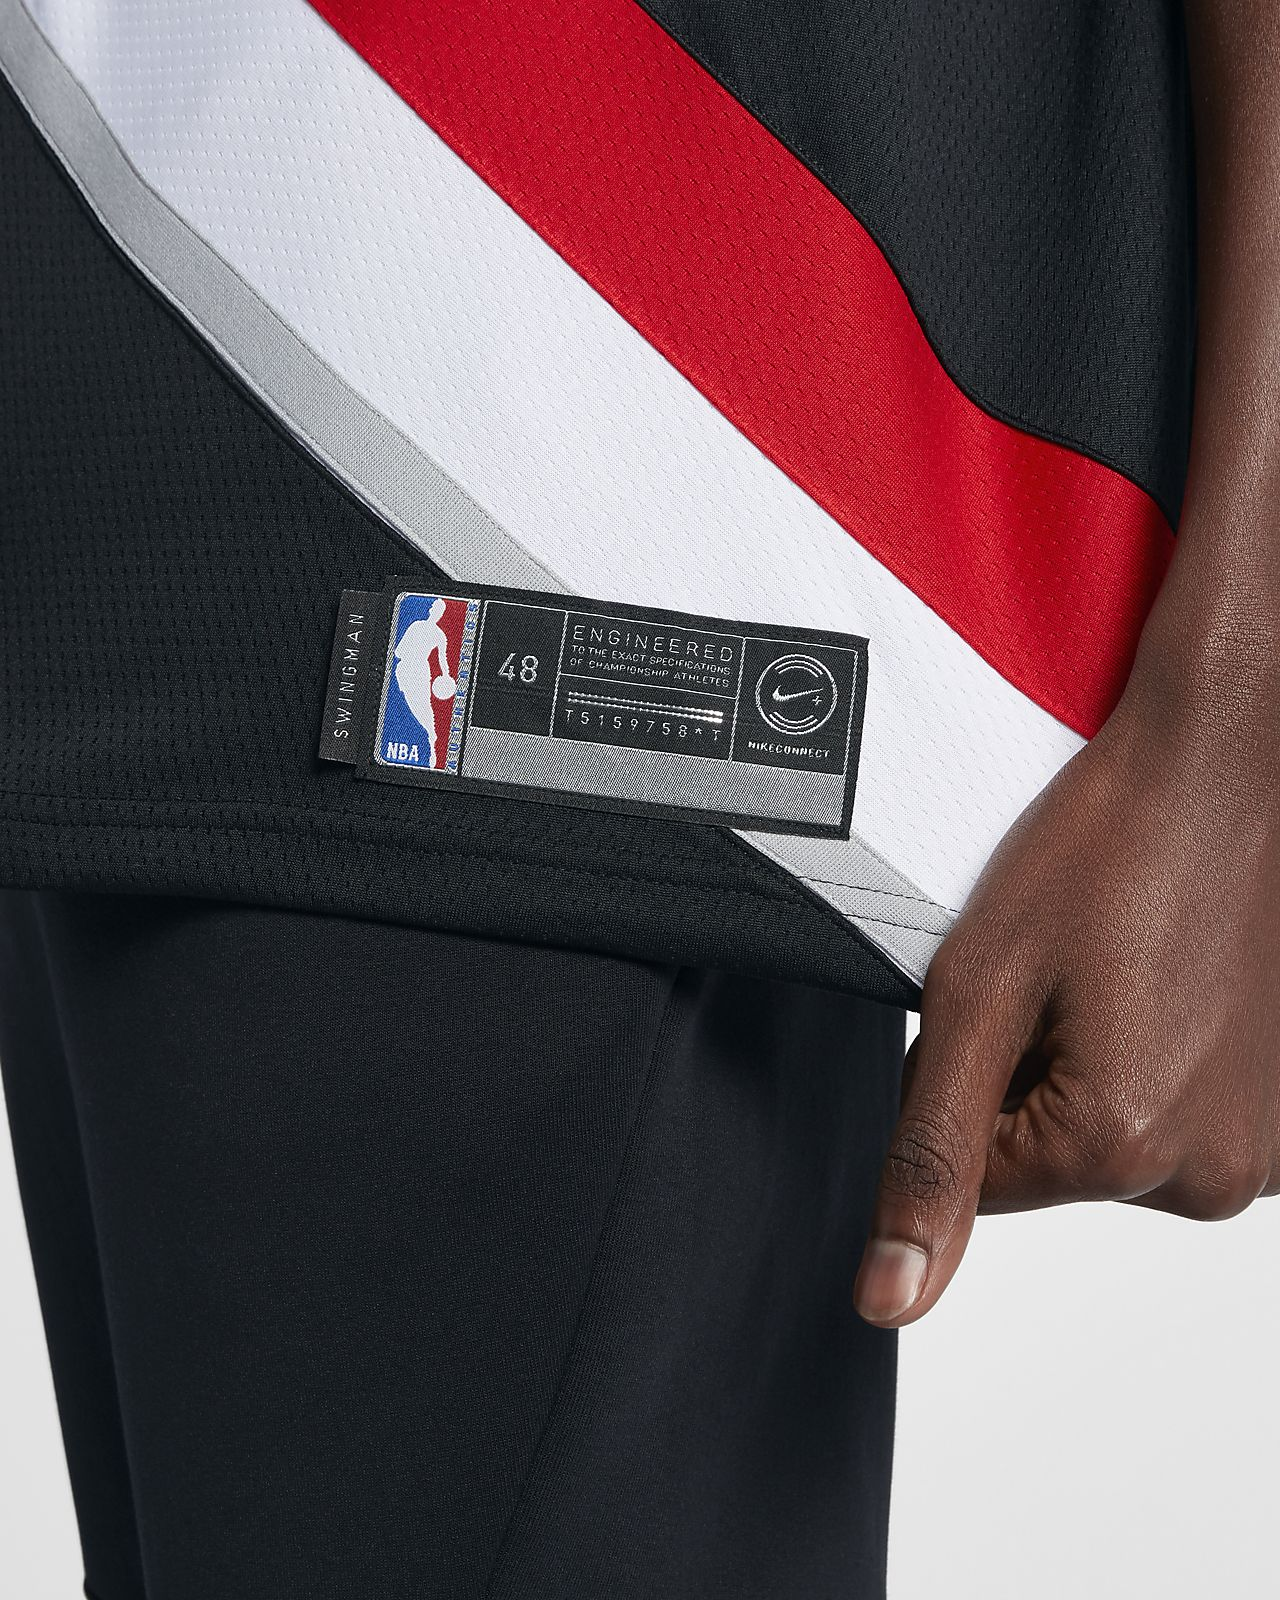 4c4e4b8fb58 ... Damian Lillard Icon Edition Swingman (Portland Trail Blazers) Men's  Nike NBA Connected Jersey